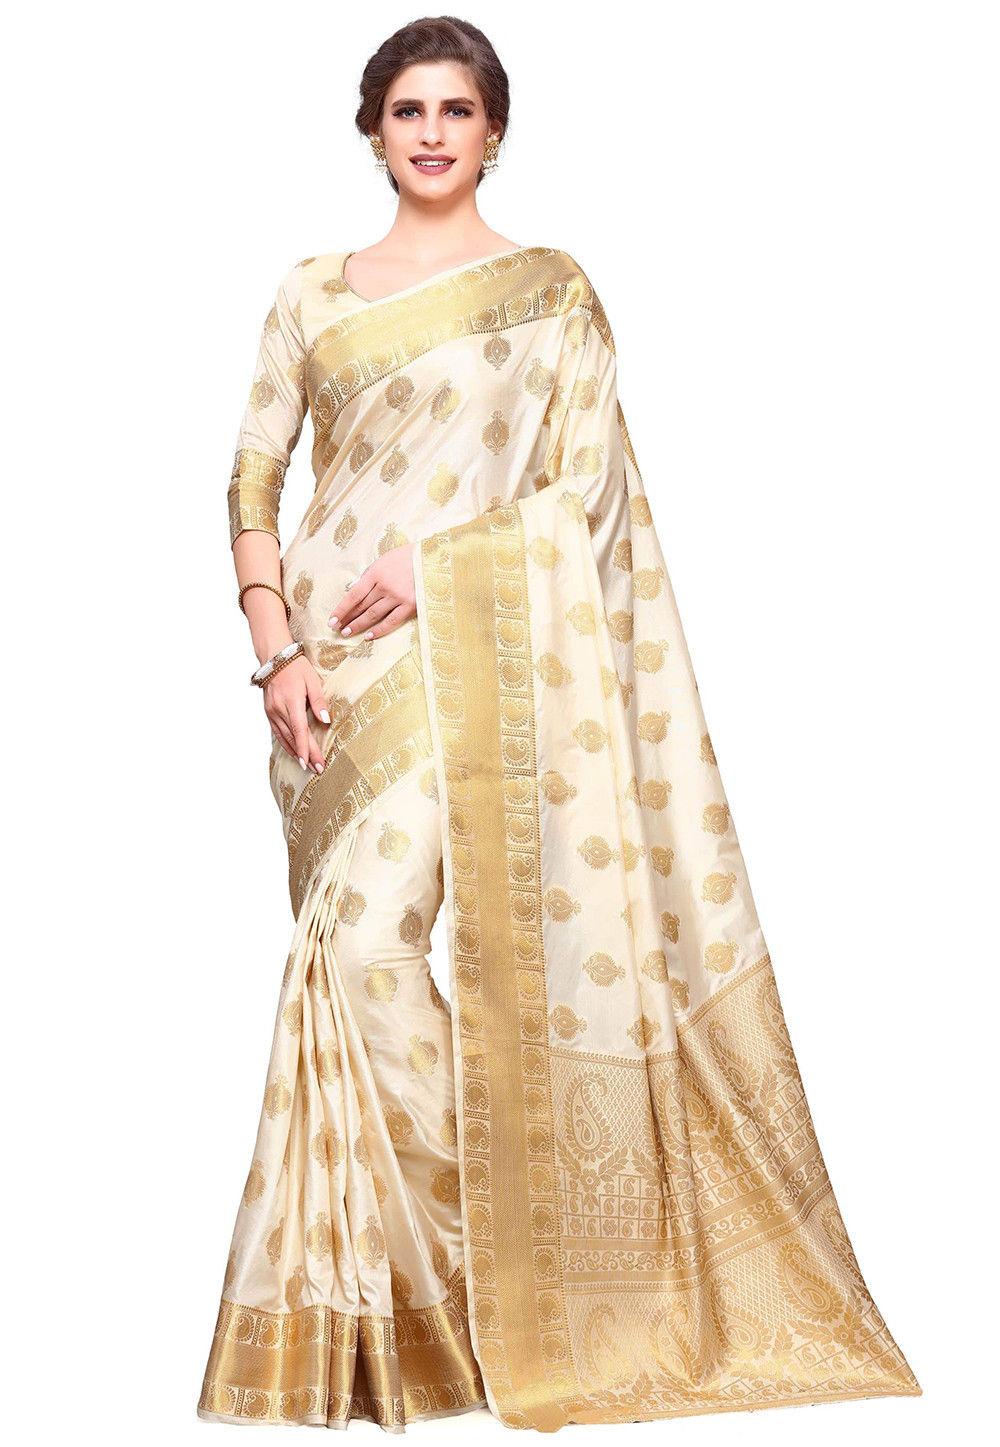 Uppada Silk Saree in Off White